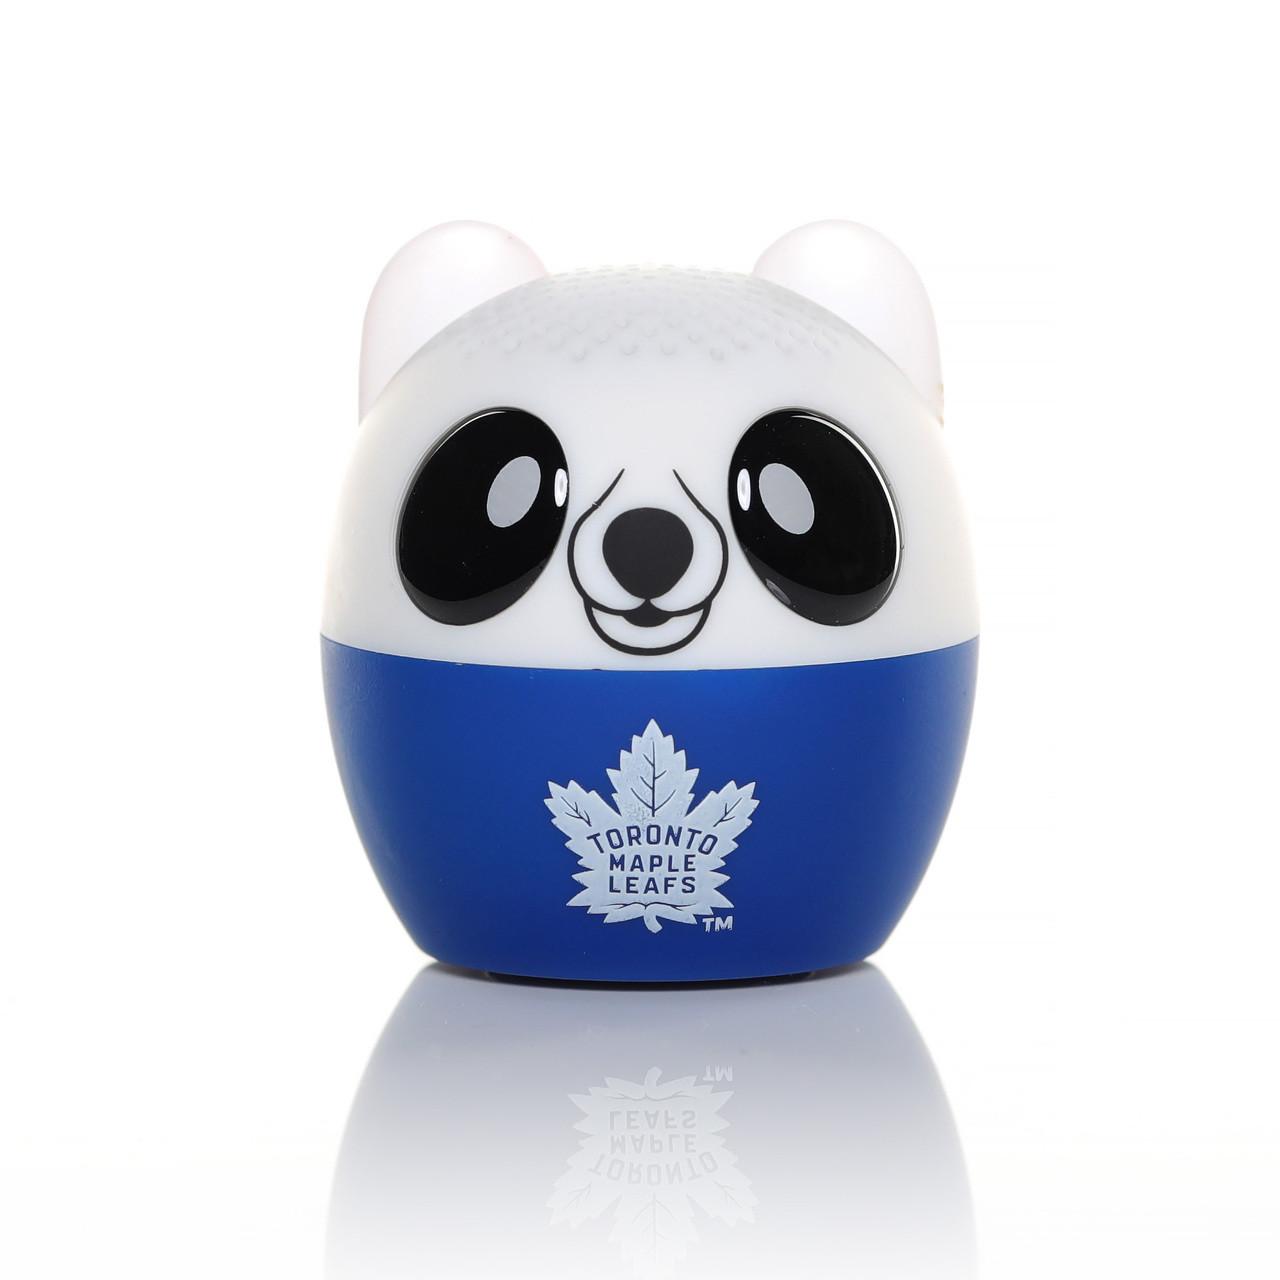 size 40 6c8a5 96b3f Toronto Maple Leafs Bitty Boomer-NHL Portable Wireless Bluetooth  Speaker-Awesome Sound